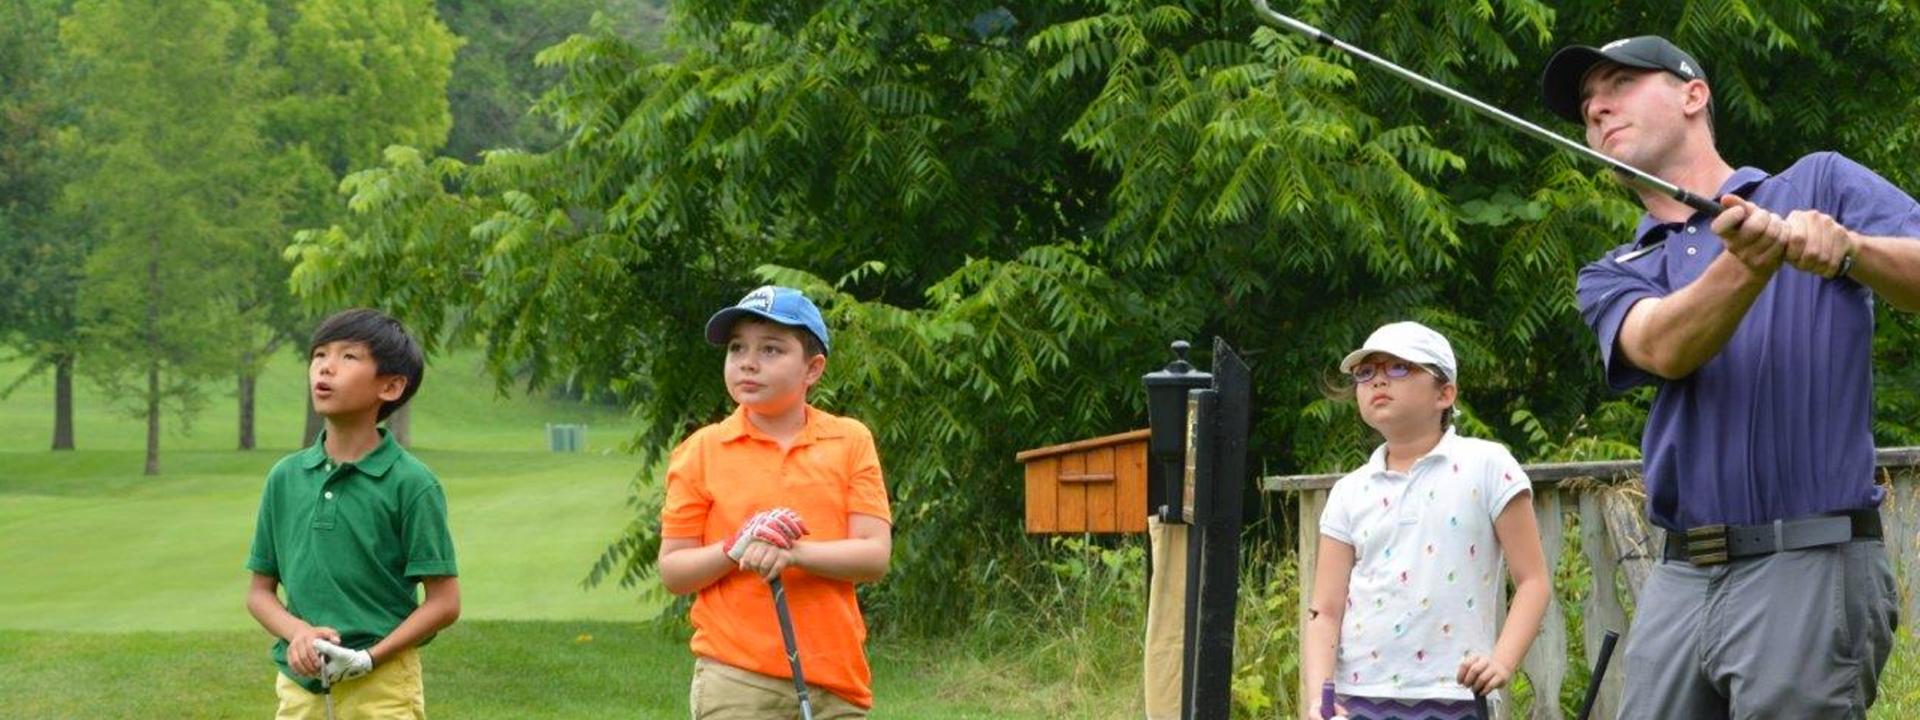 three kids and a man golfing